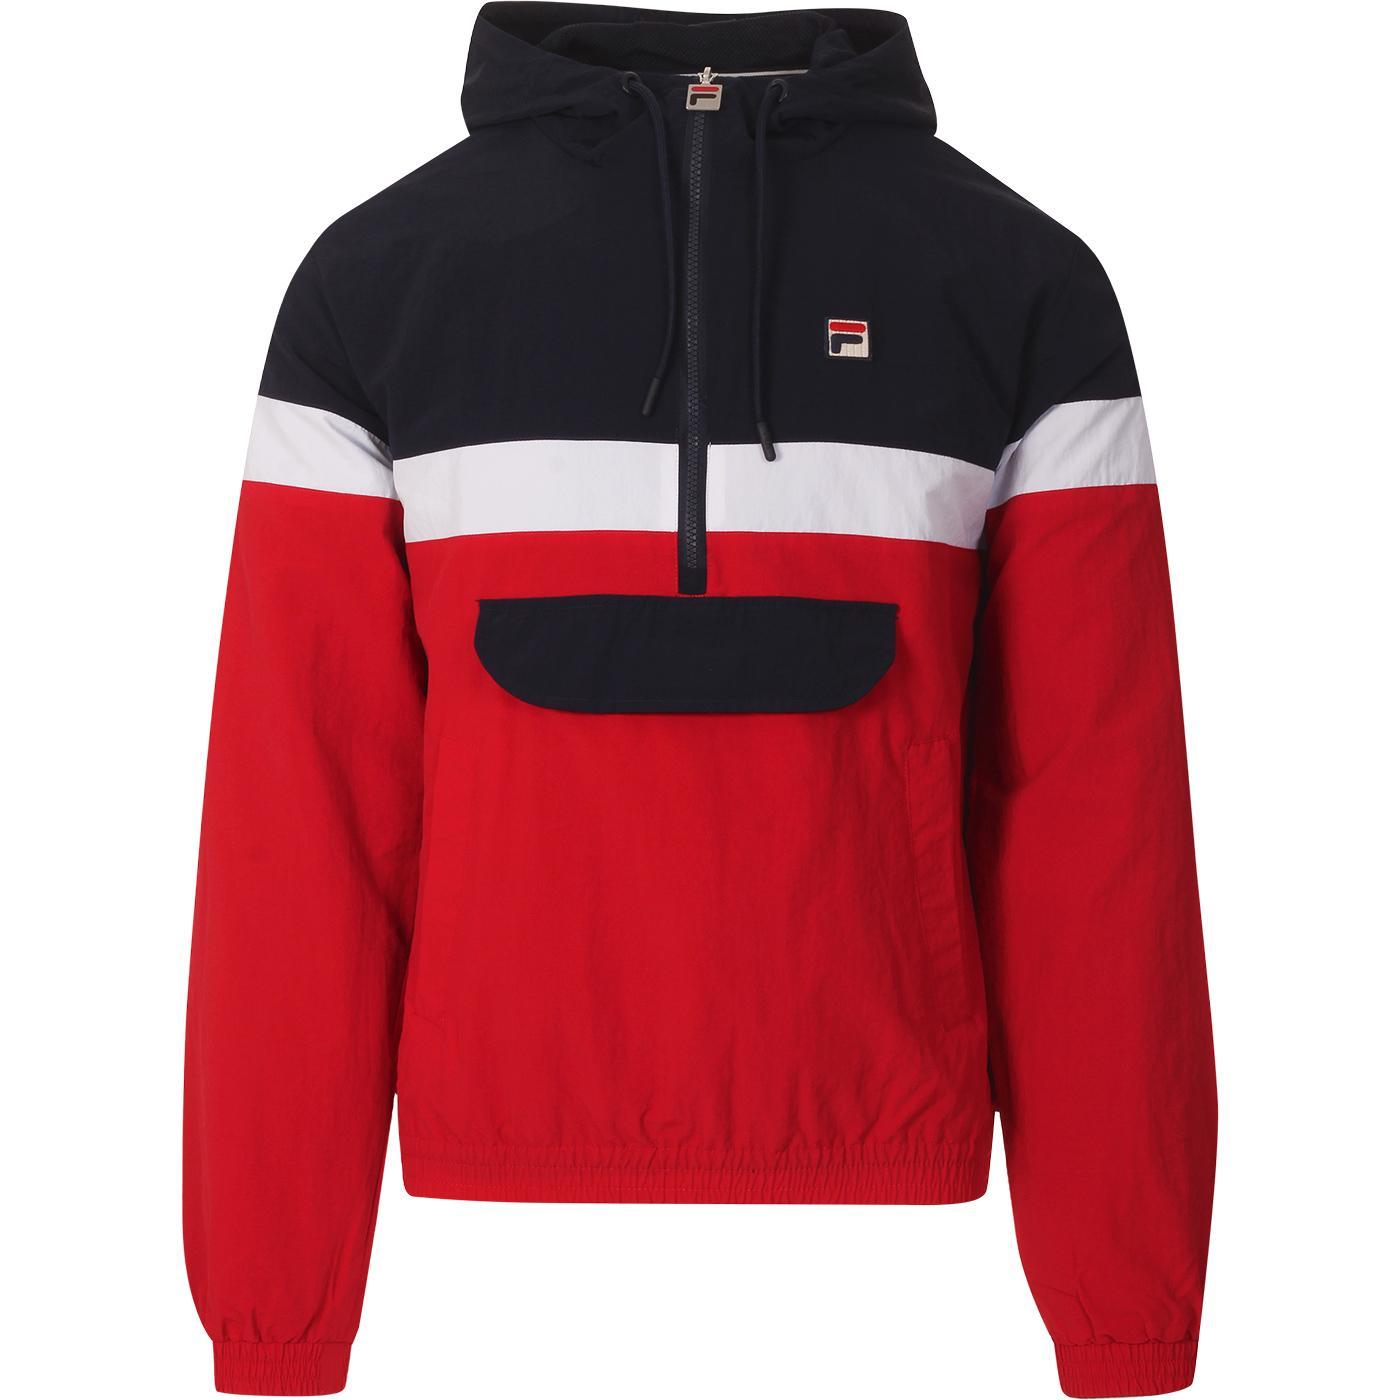 Jacoby FILA VINTAGE Retro Colour Block OH Jacket